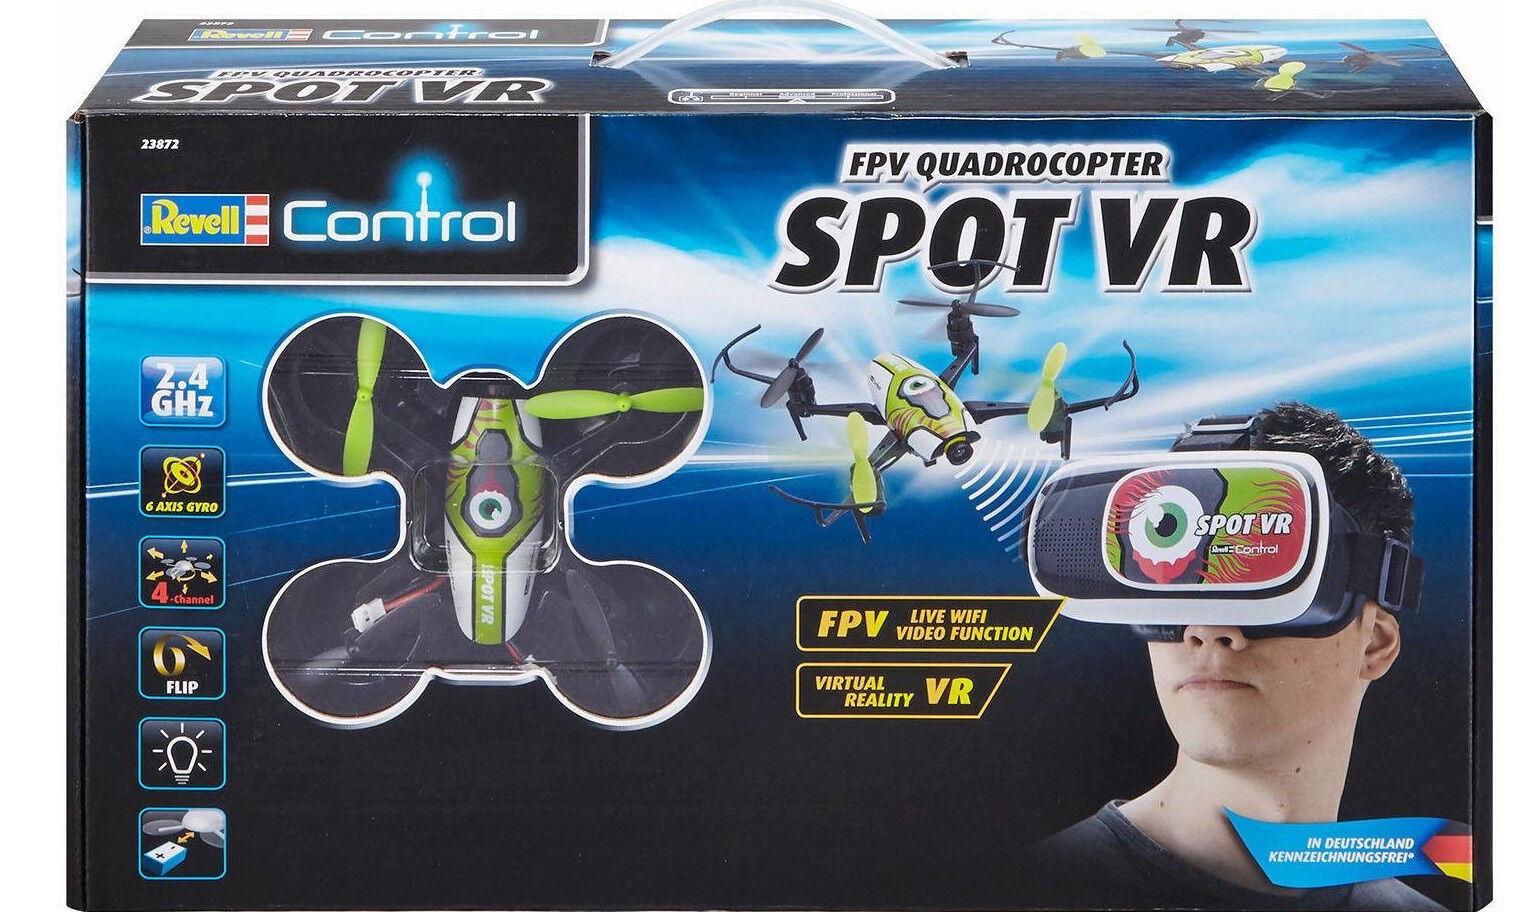 Rc Quadrocopter mit Kamera f. Virutal Reality